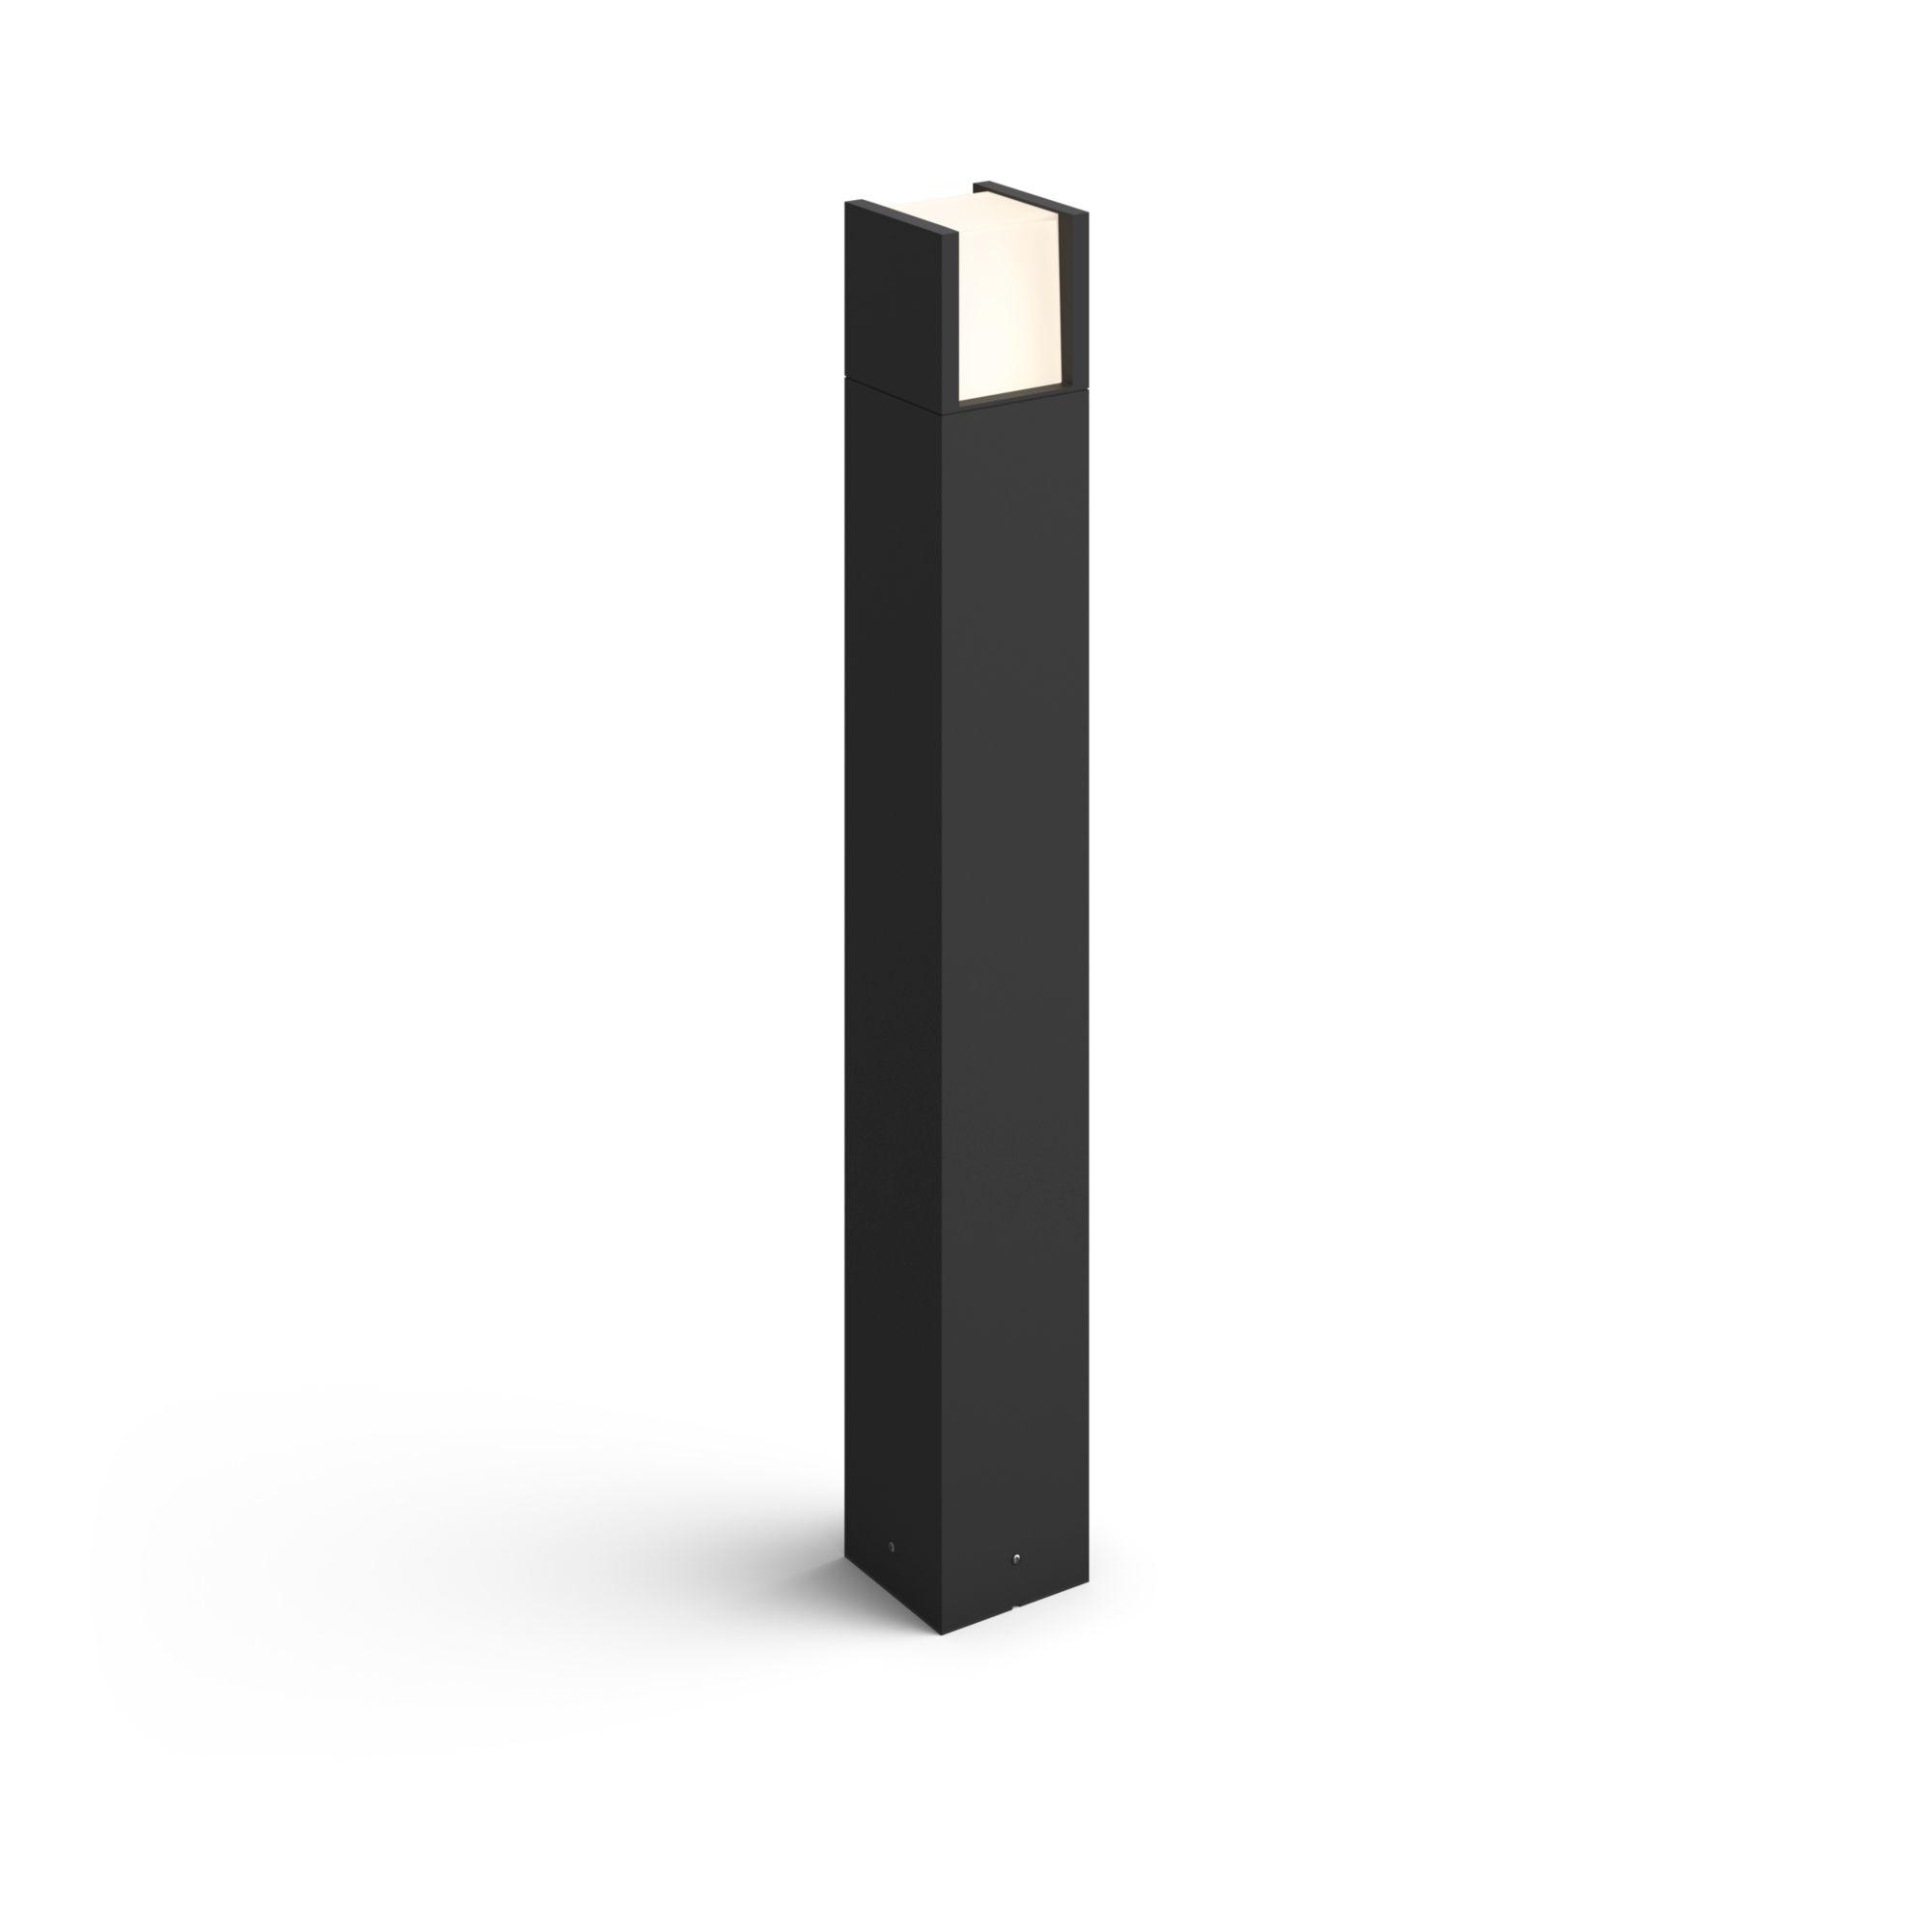 Philips Hue Fuzo LED Wegleuchte schwarz